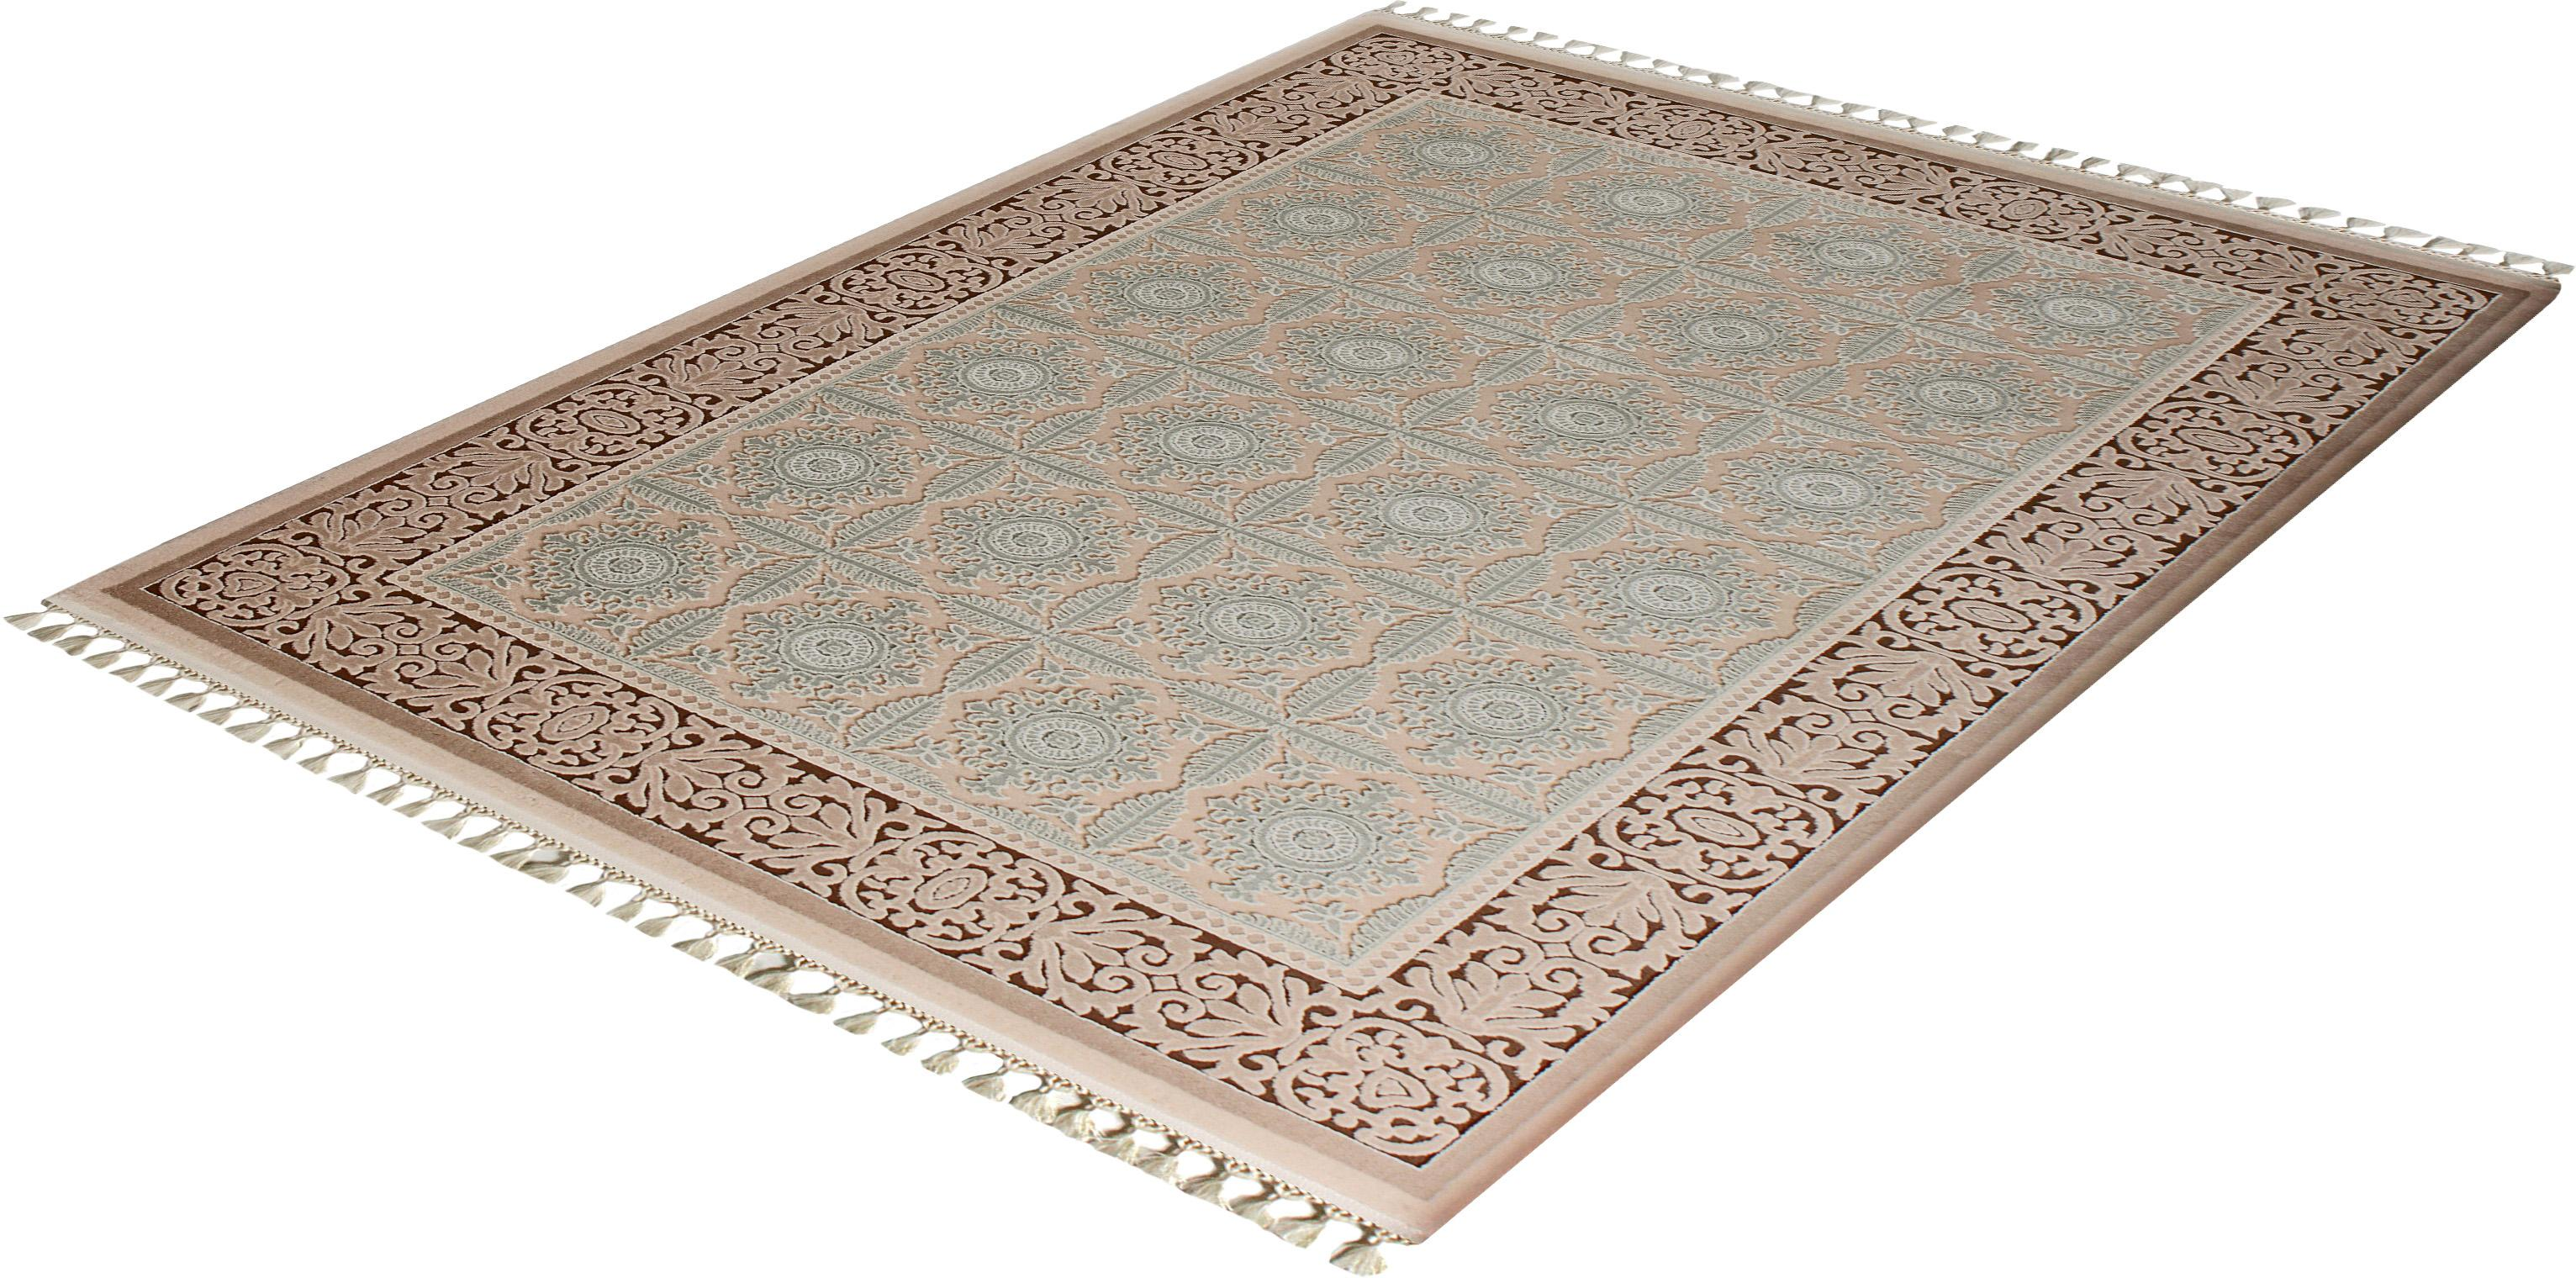 Orientteppich Delüks 6825 Sanat Teppiche rechteckig Höhe 14 mm